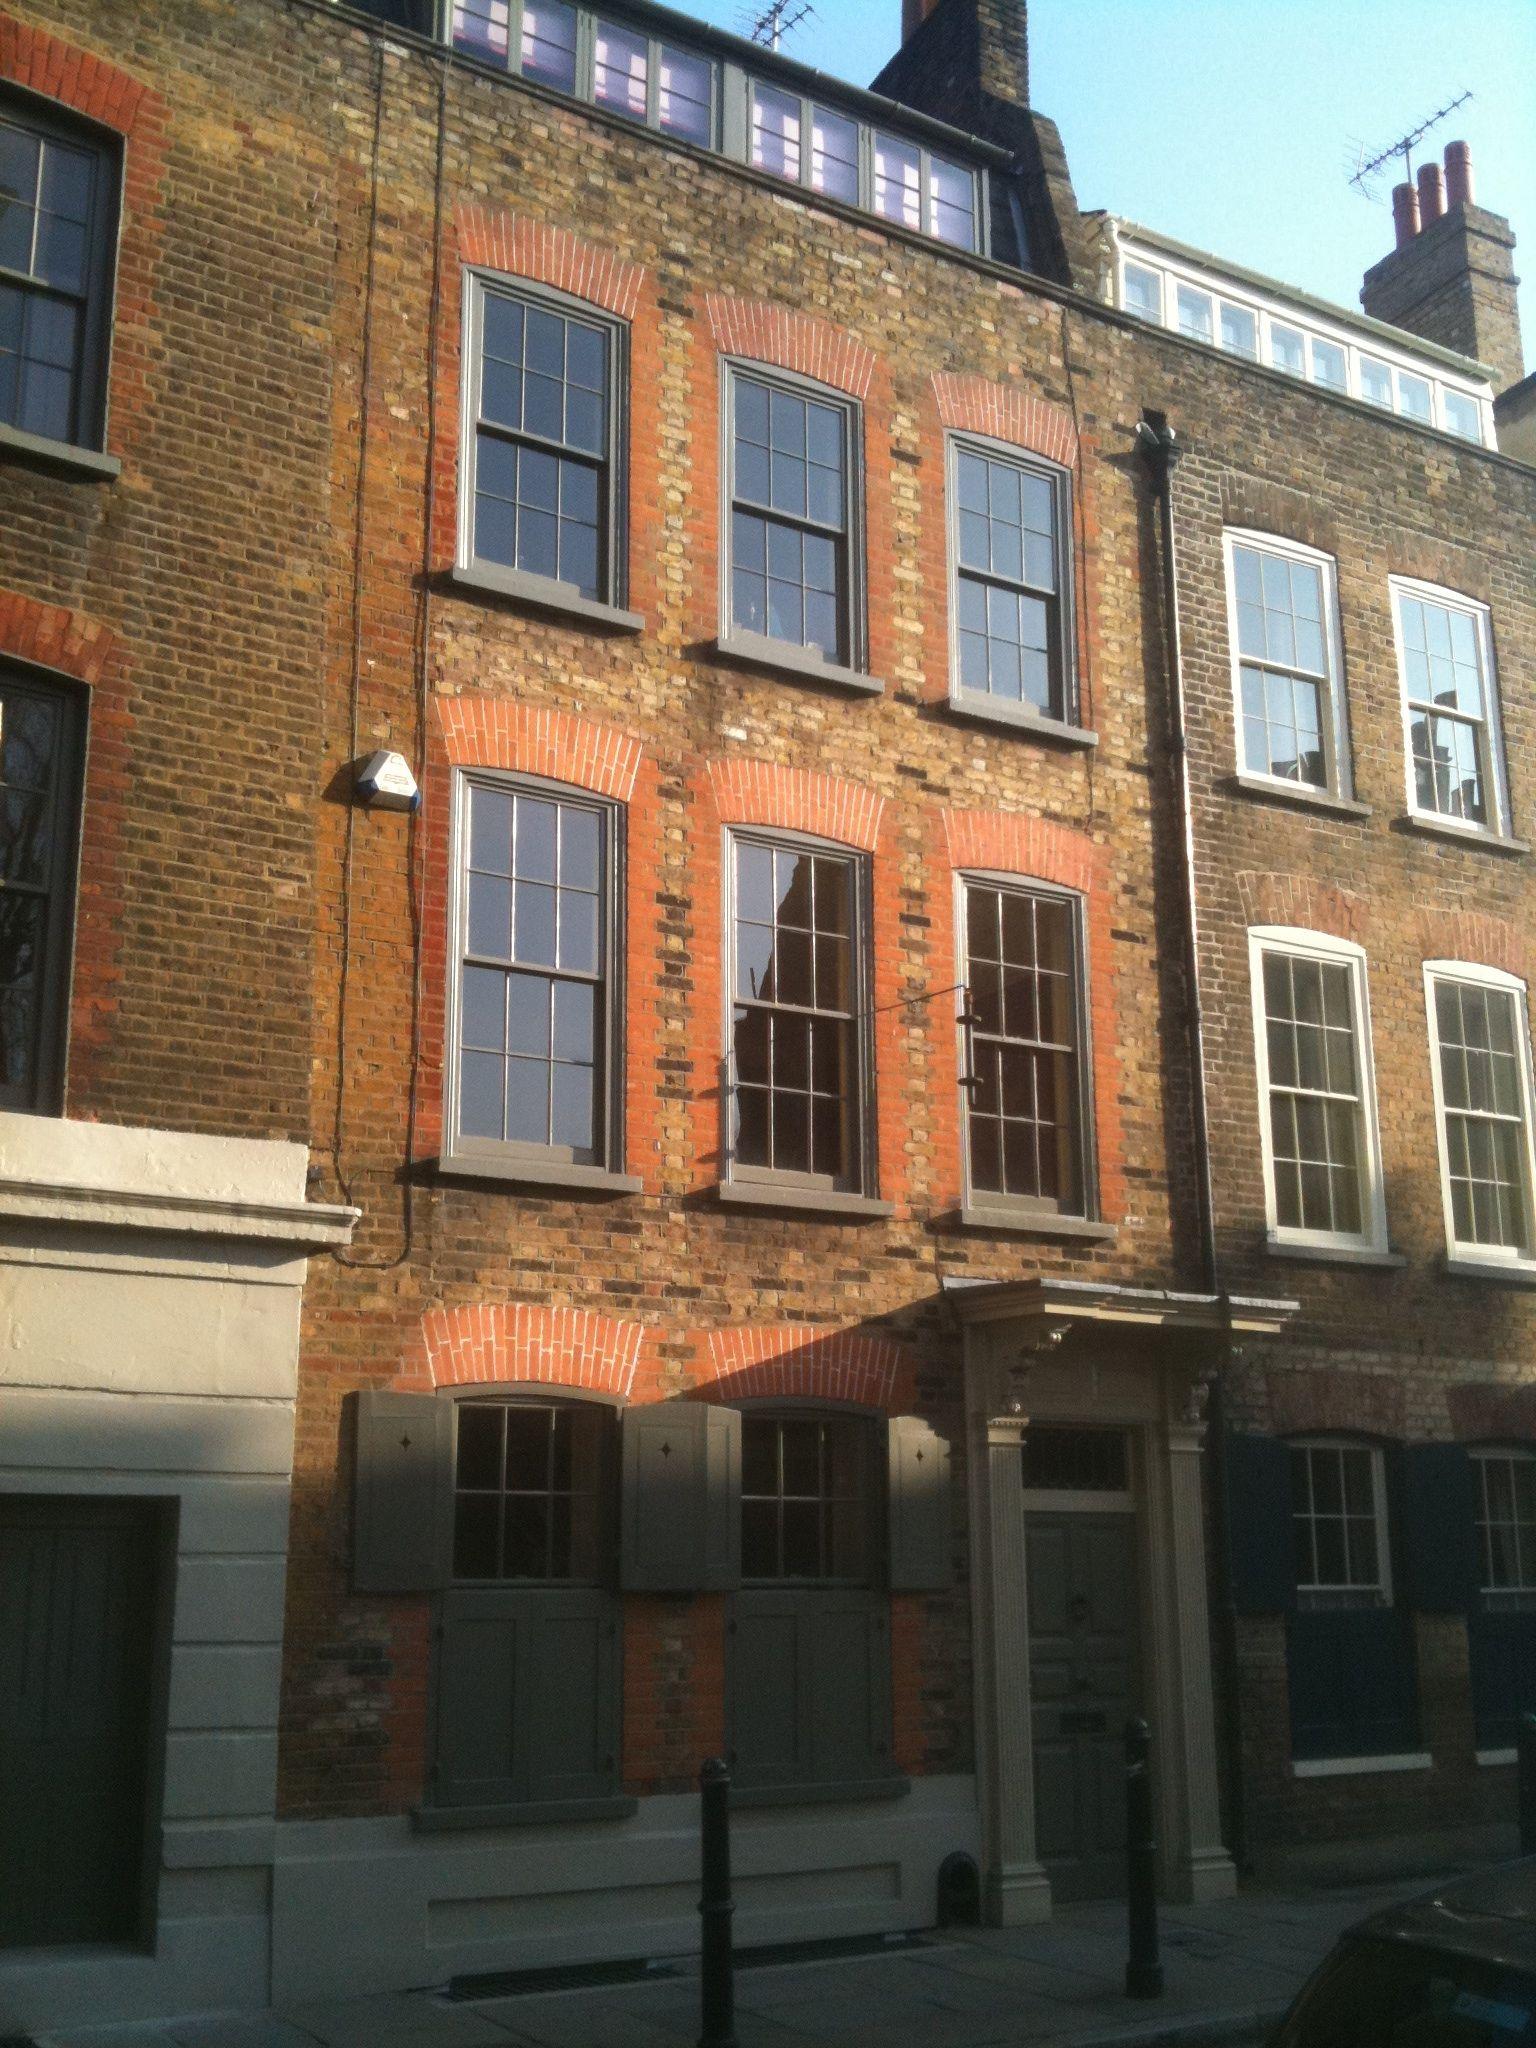 Georgian Houses Fournier Street Th Century London Pinterest - Beautiful georgian house in london